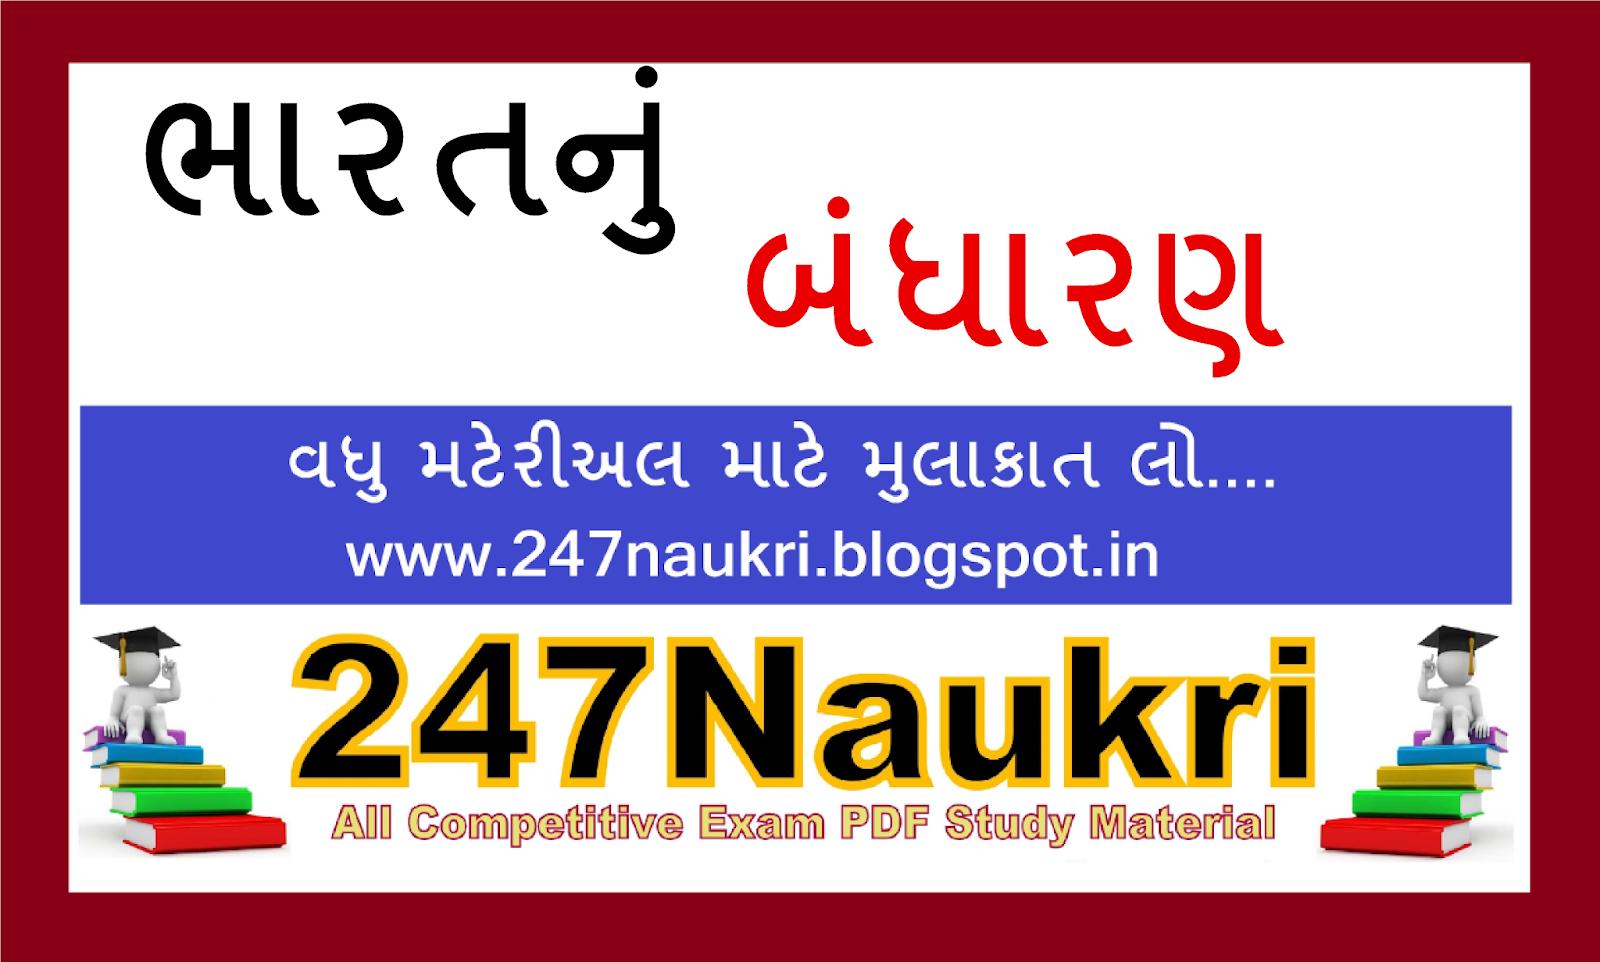 Gpsc Study Material In Gujarati Pdf